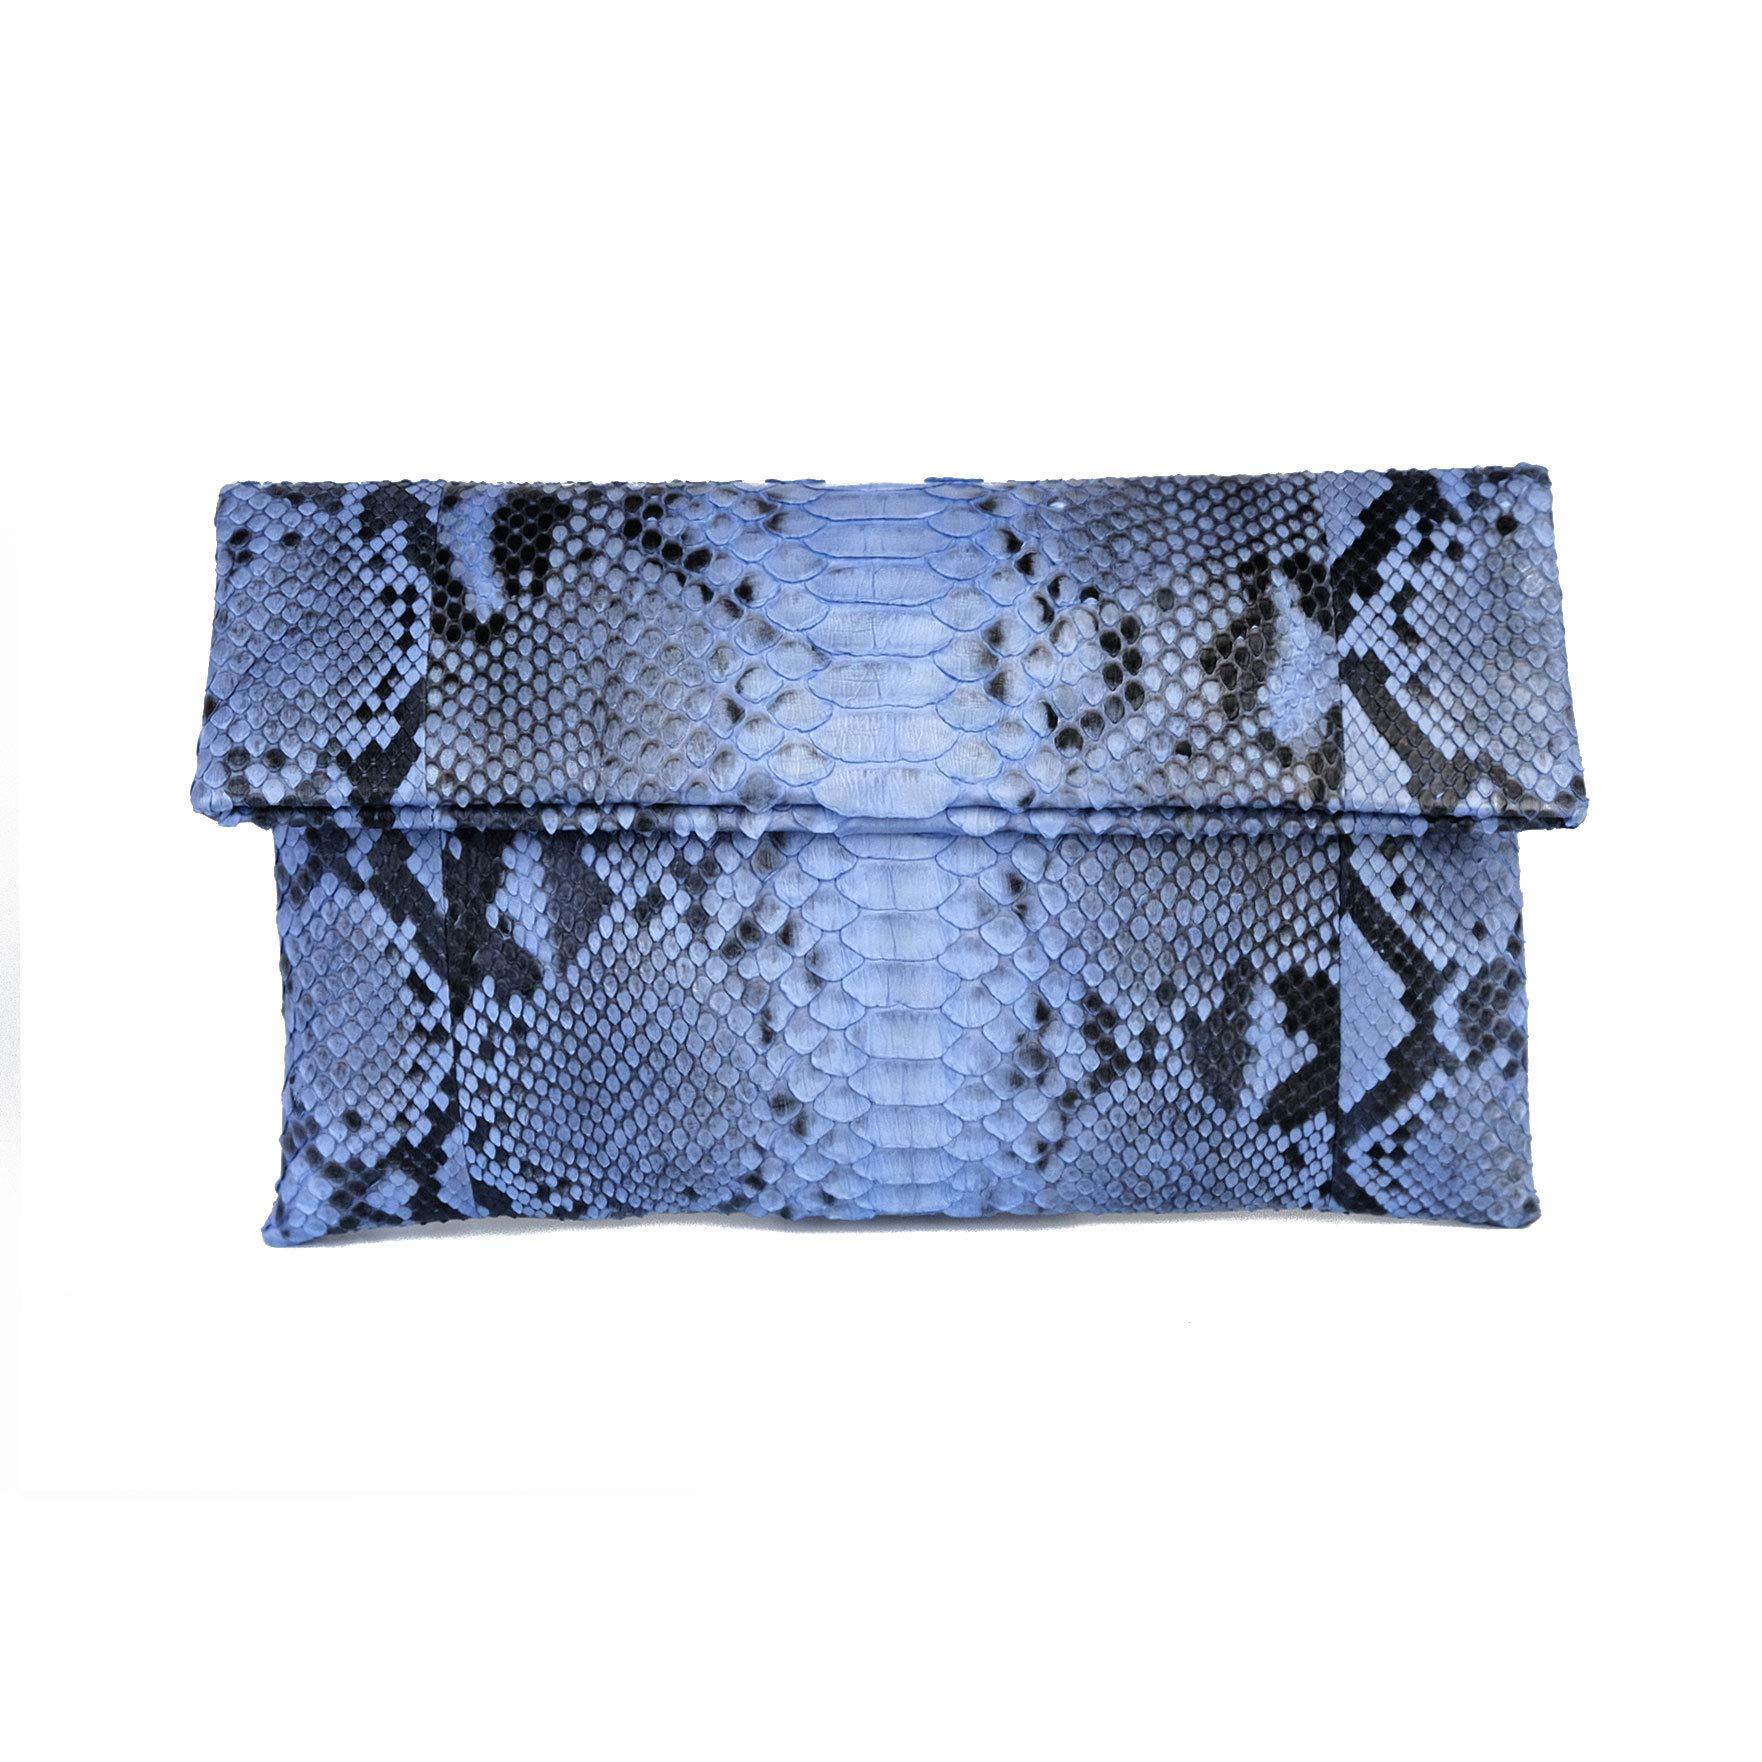 Genuine Light Blue Motif Python Leather Classic Foldover Clutch Bag